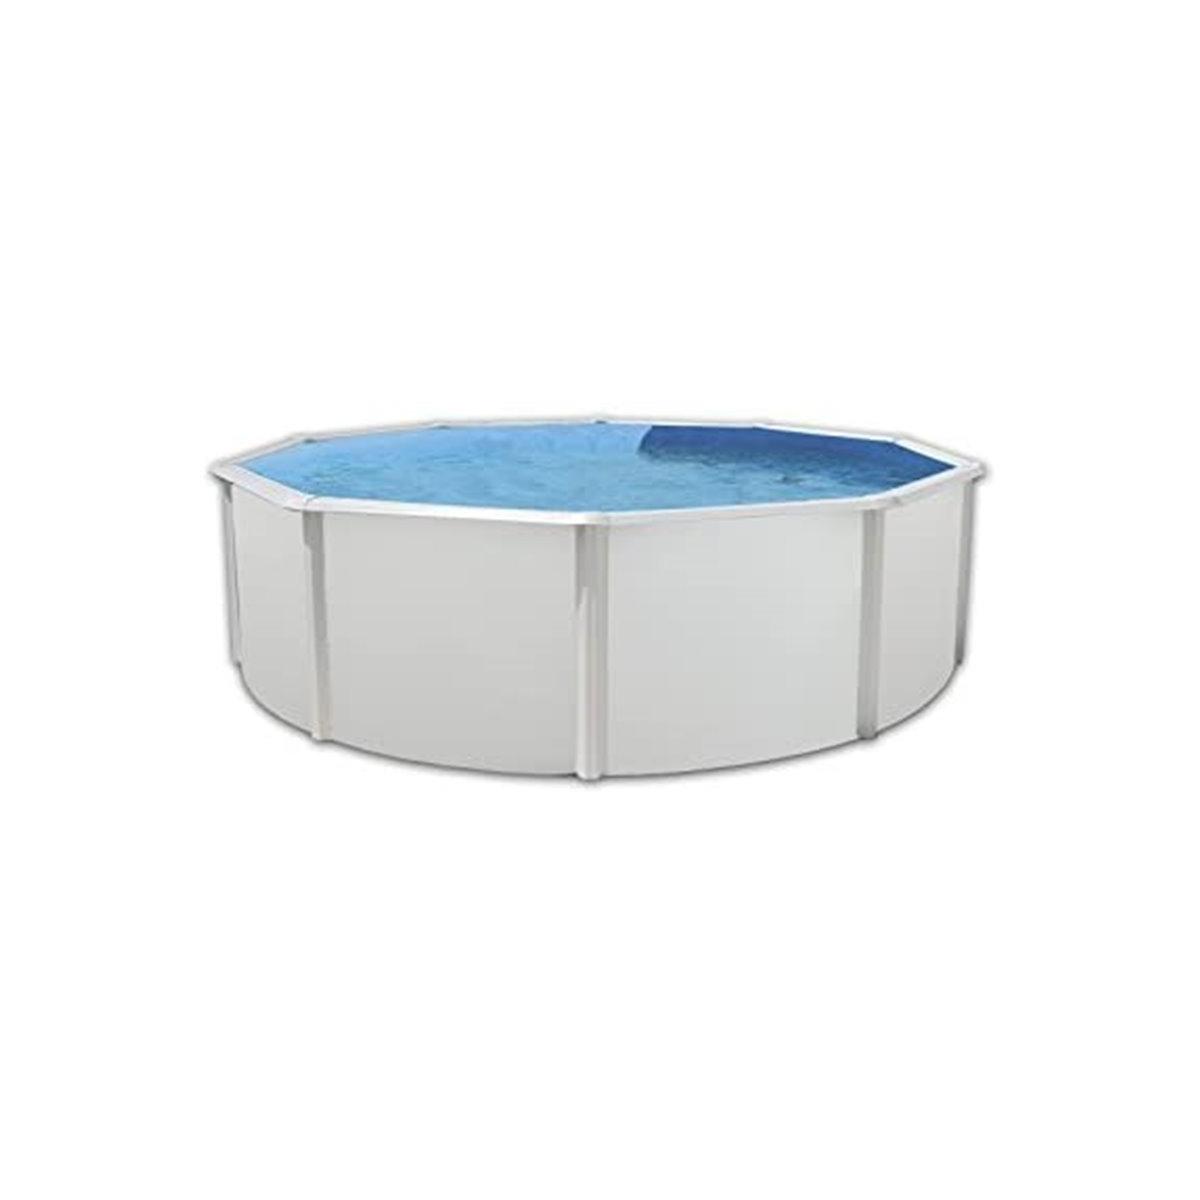 Piscina Desmontable Toi Circular 460X90 PTC403